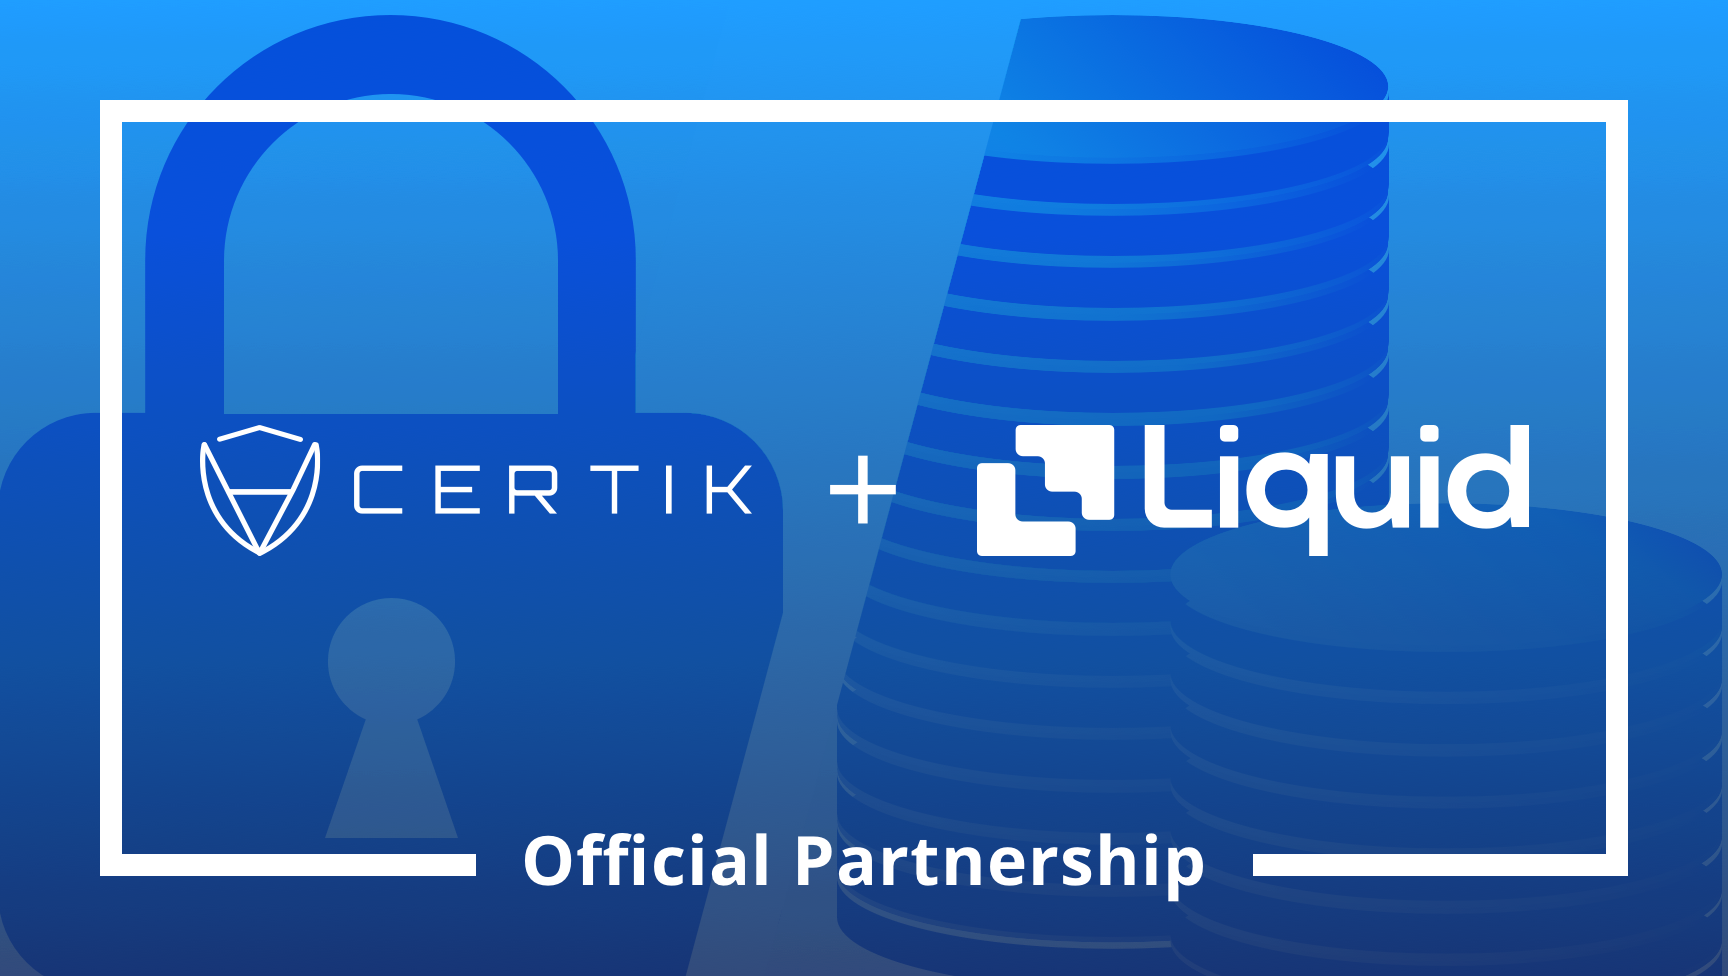 CertiKおよびリキッドグループ株式会社の業務提携に関するお知らせ